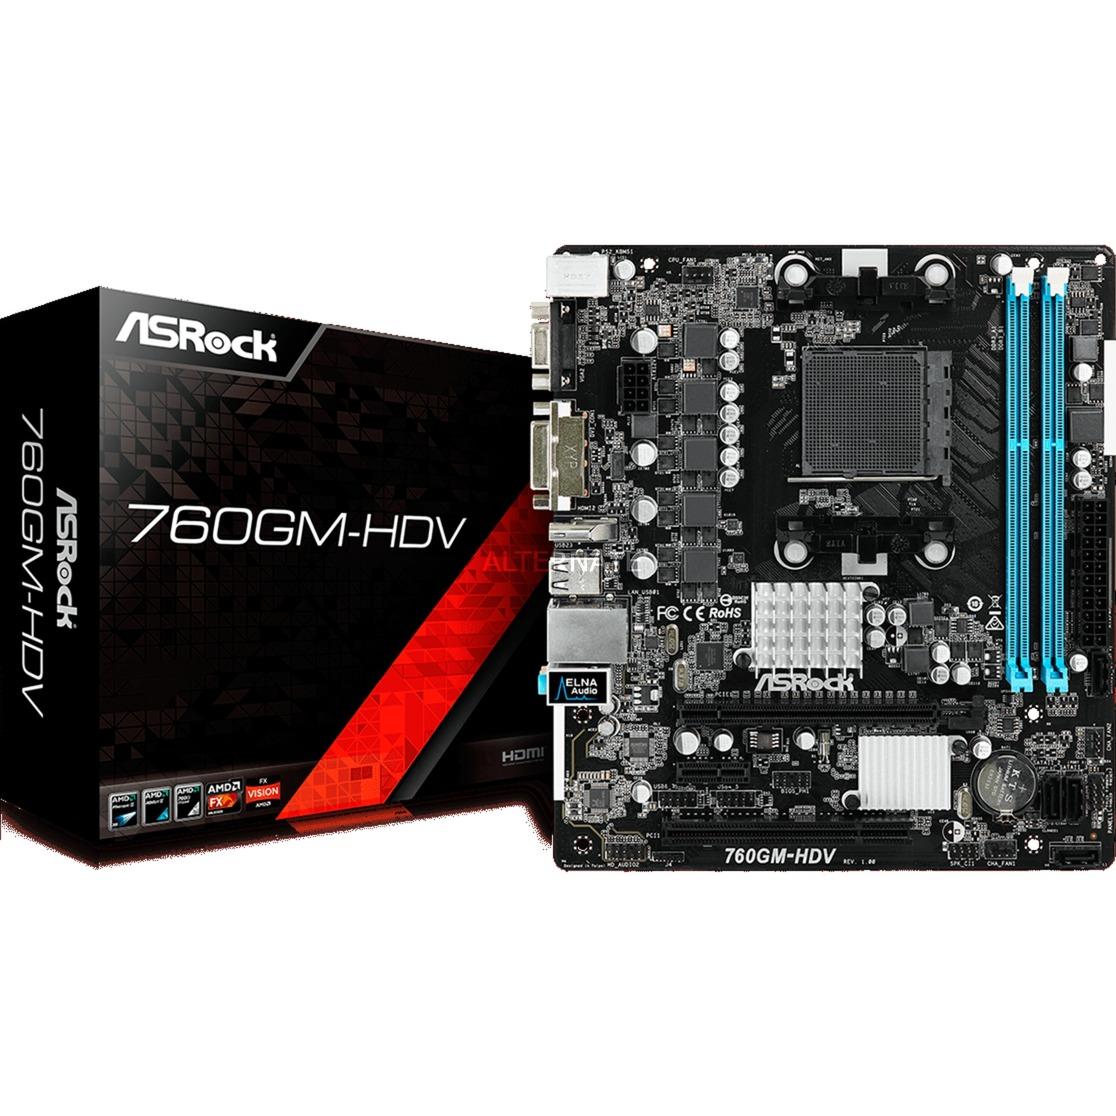 760GM-HDV placa base Socket AM3+ Micro ATX AMD 760G